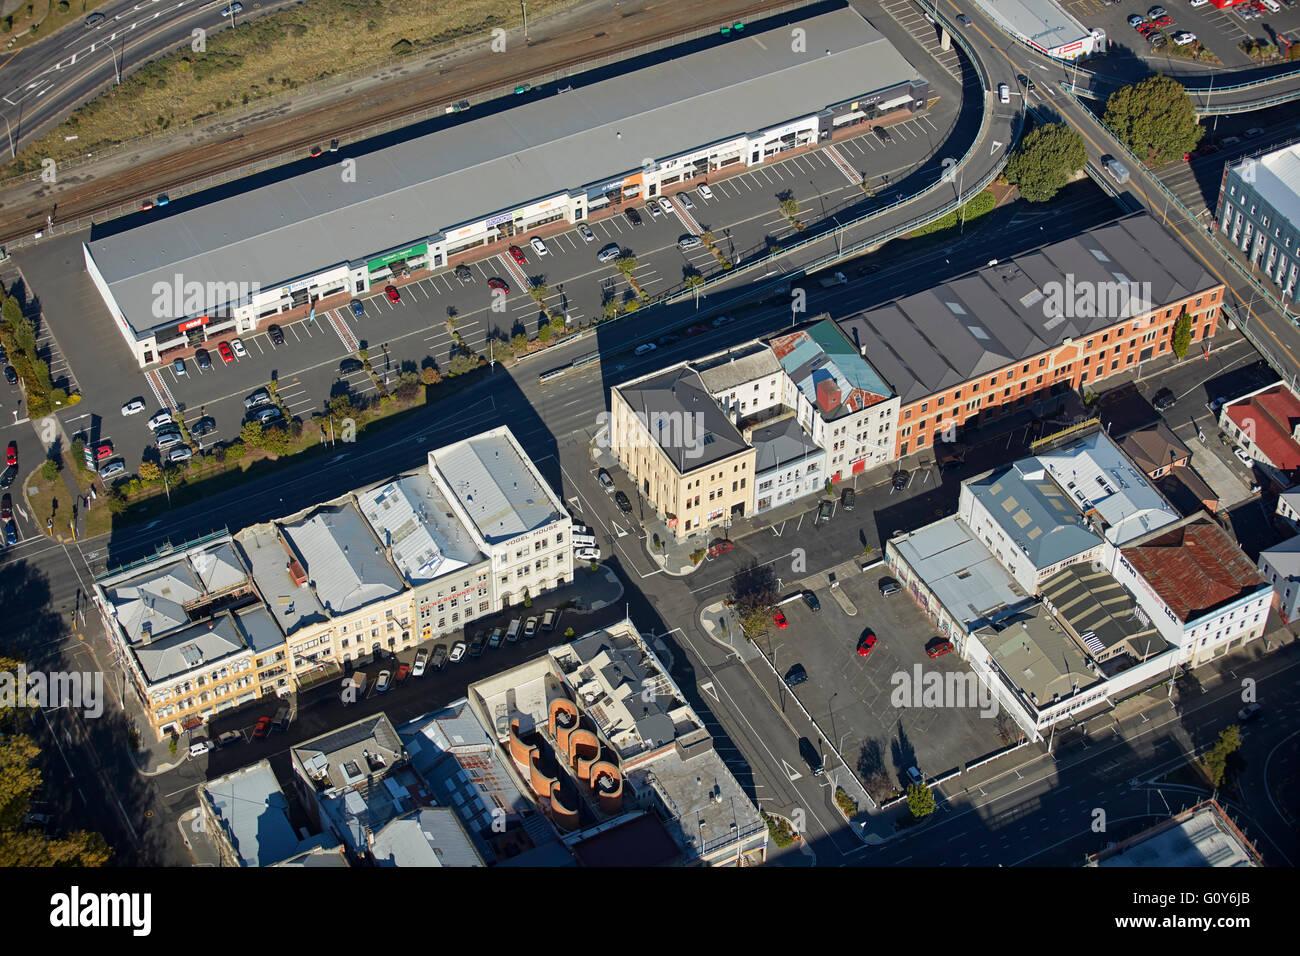 Vogel Street, historic and IT precinct, Dunedin, Otago, South Island, New Zealand - aerial - Stock Image